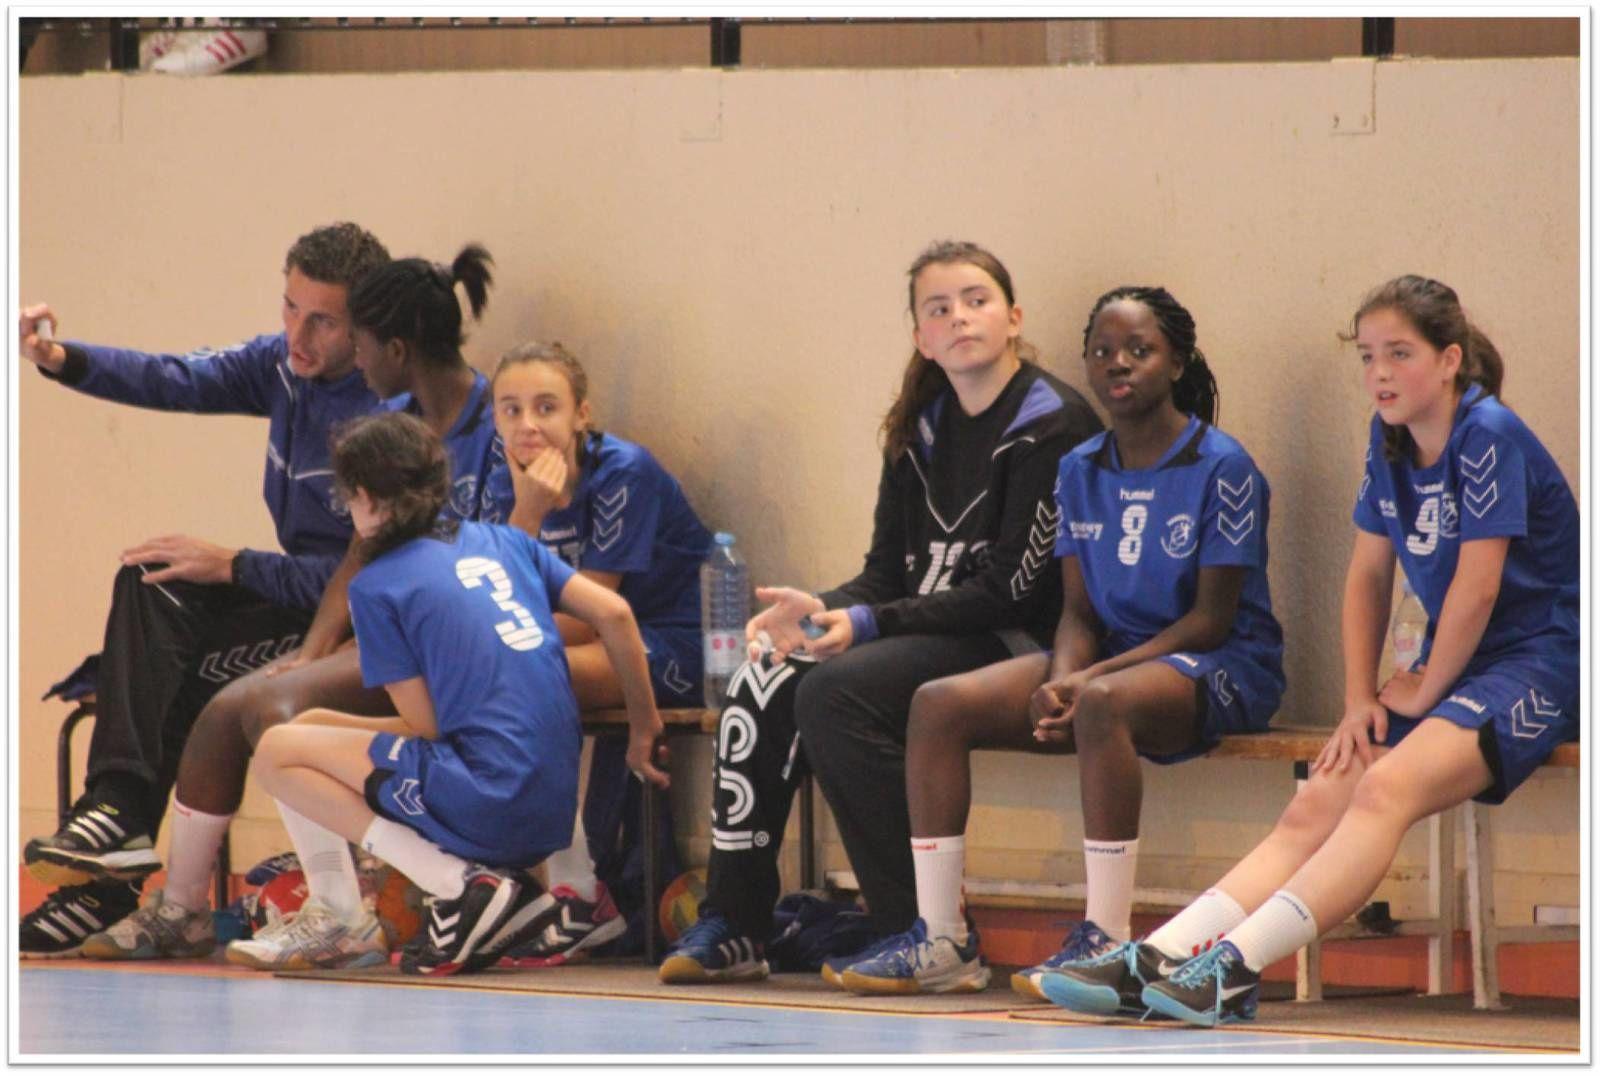 Inter-Comités Féminins (Torcy 01.11.2014) 1/3